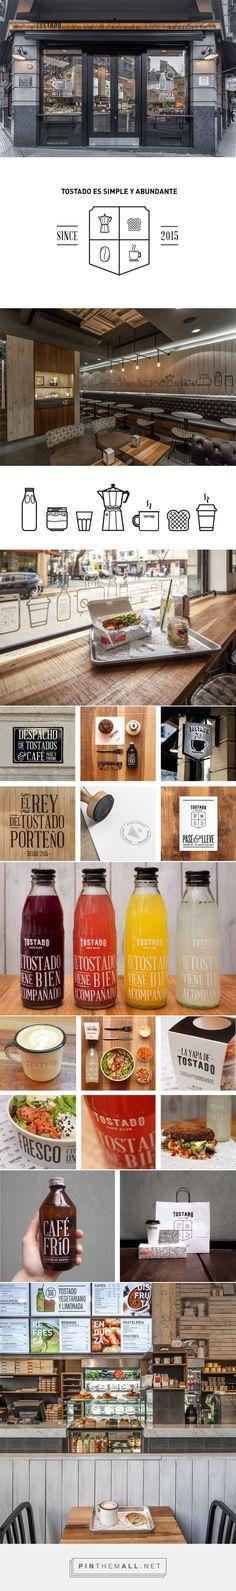 Tostado Cafe Club | Identity Designed - created via https://pinthemall.net